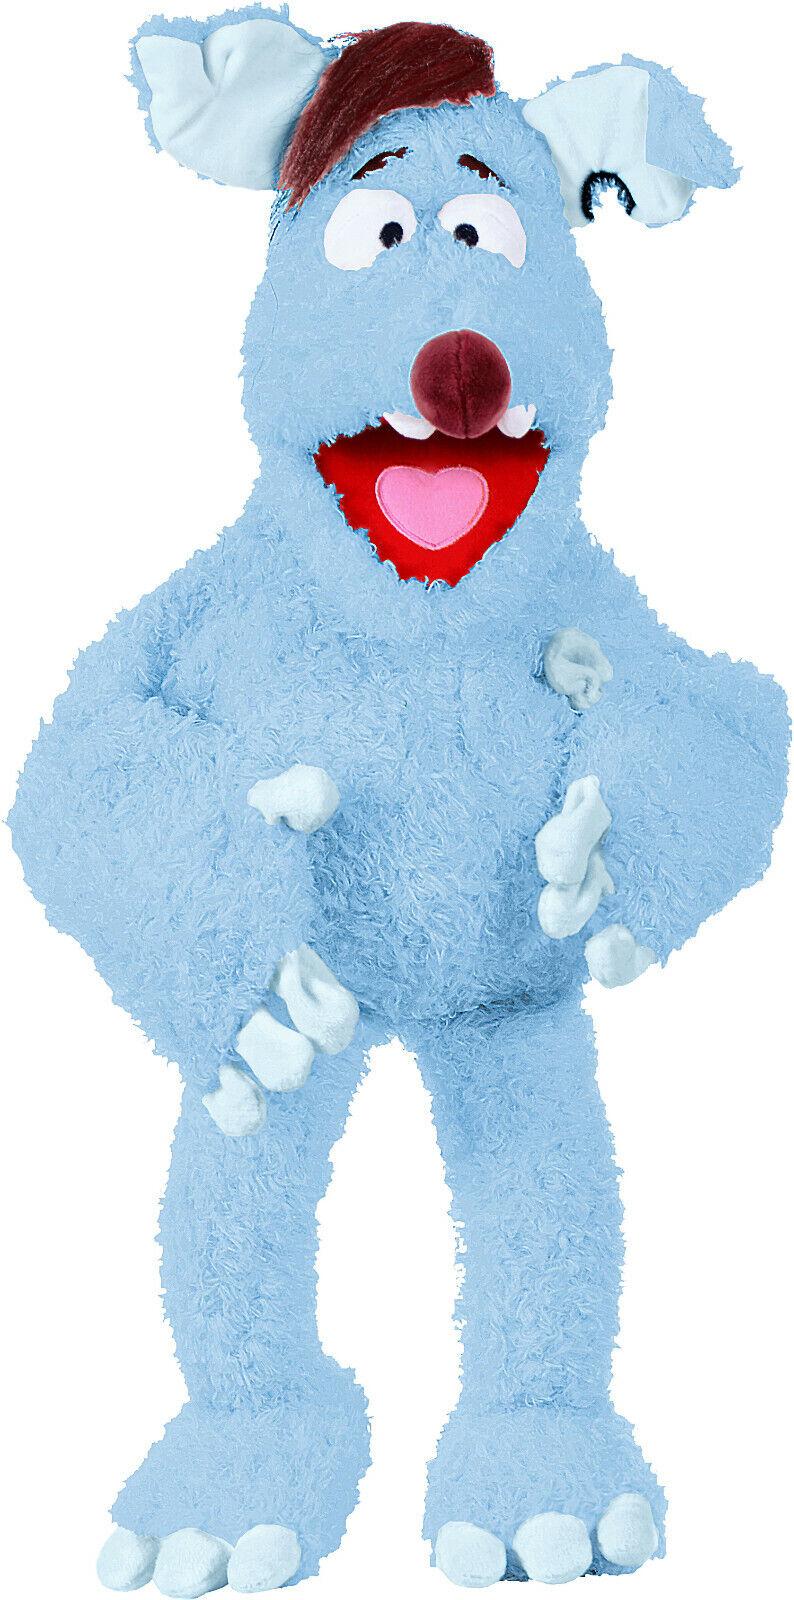 mas barato Living Living Living Puppets WG100 Woozel Marioneta   Títere en Azul Felpa 45cm Klappmaul  lo último